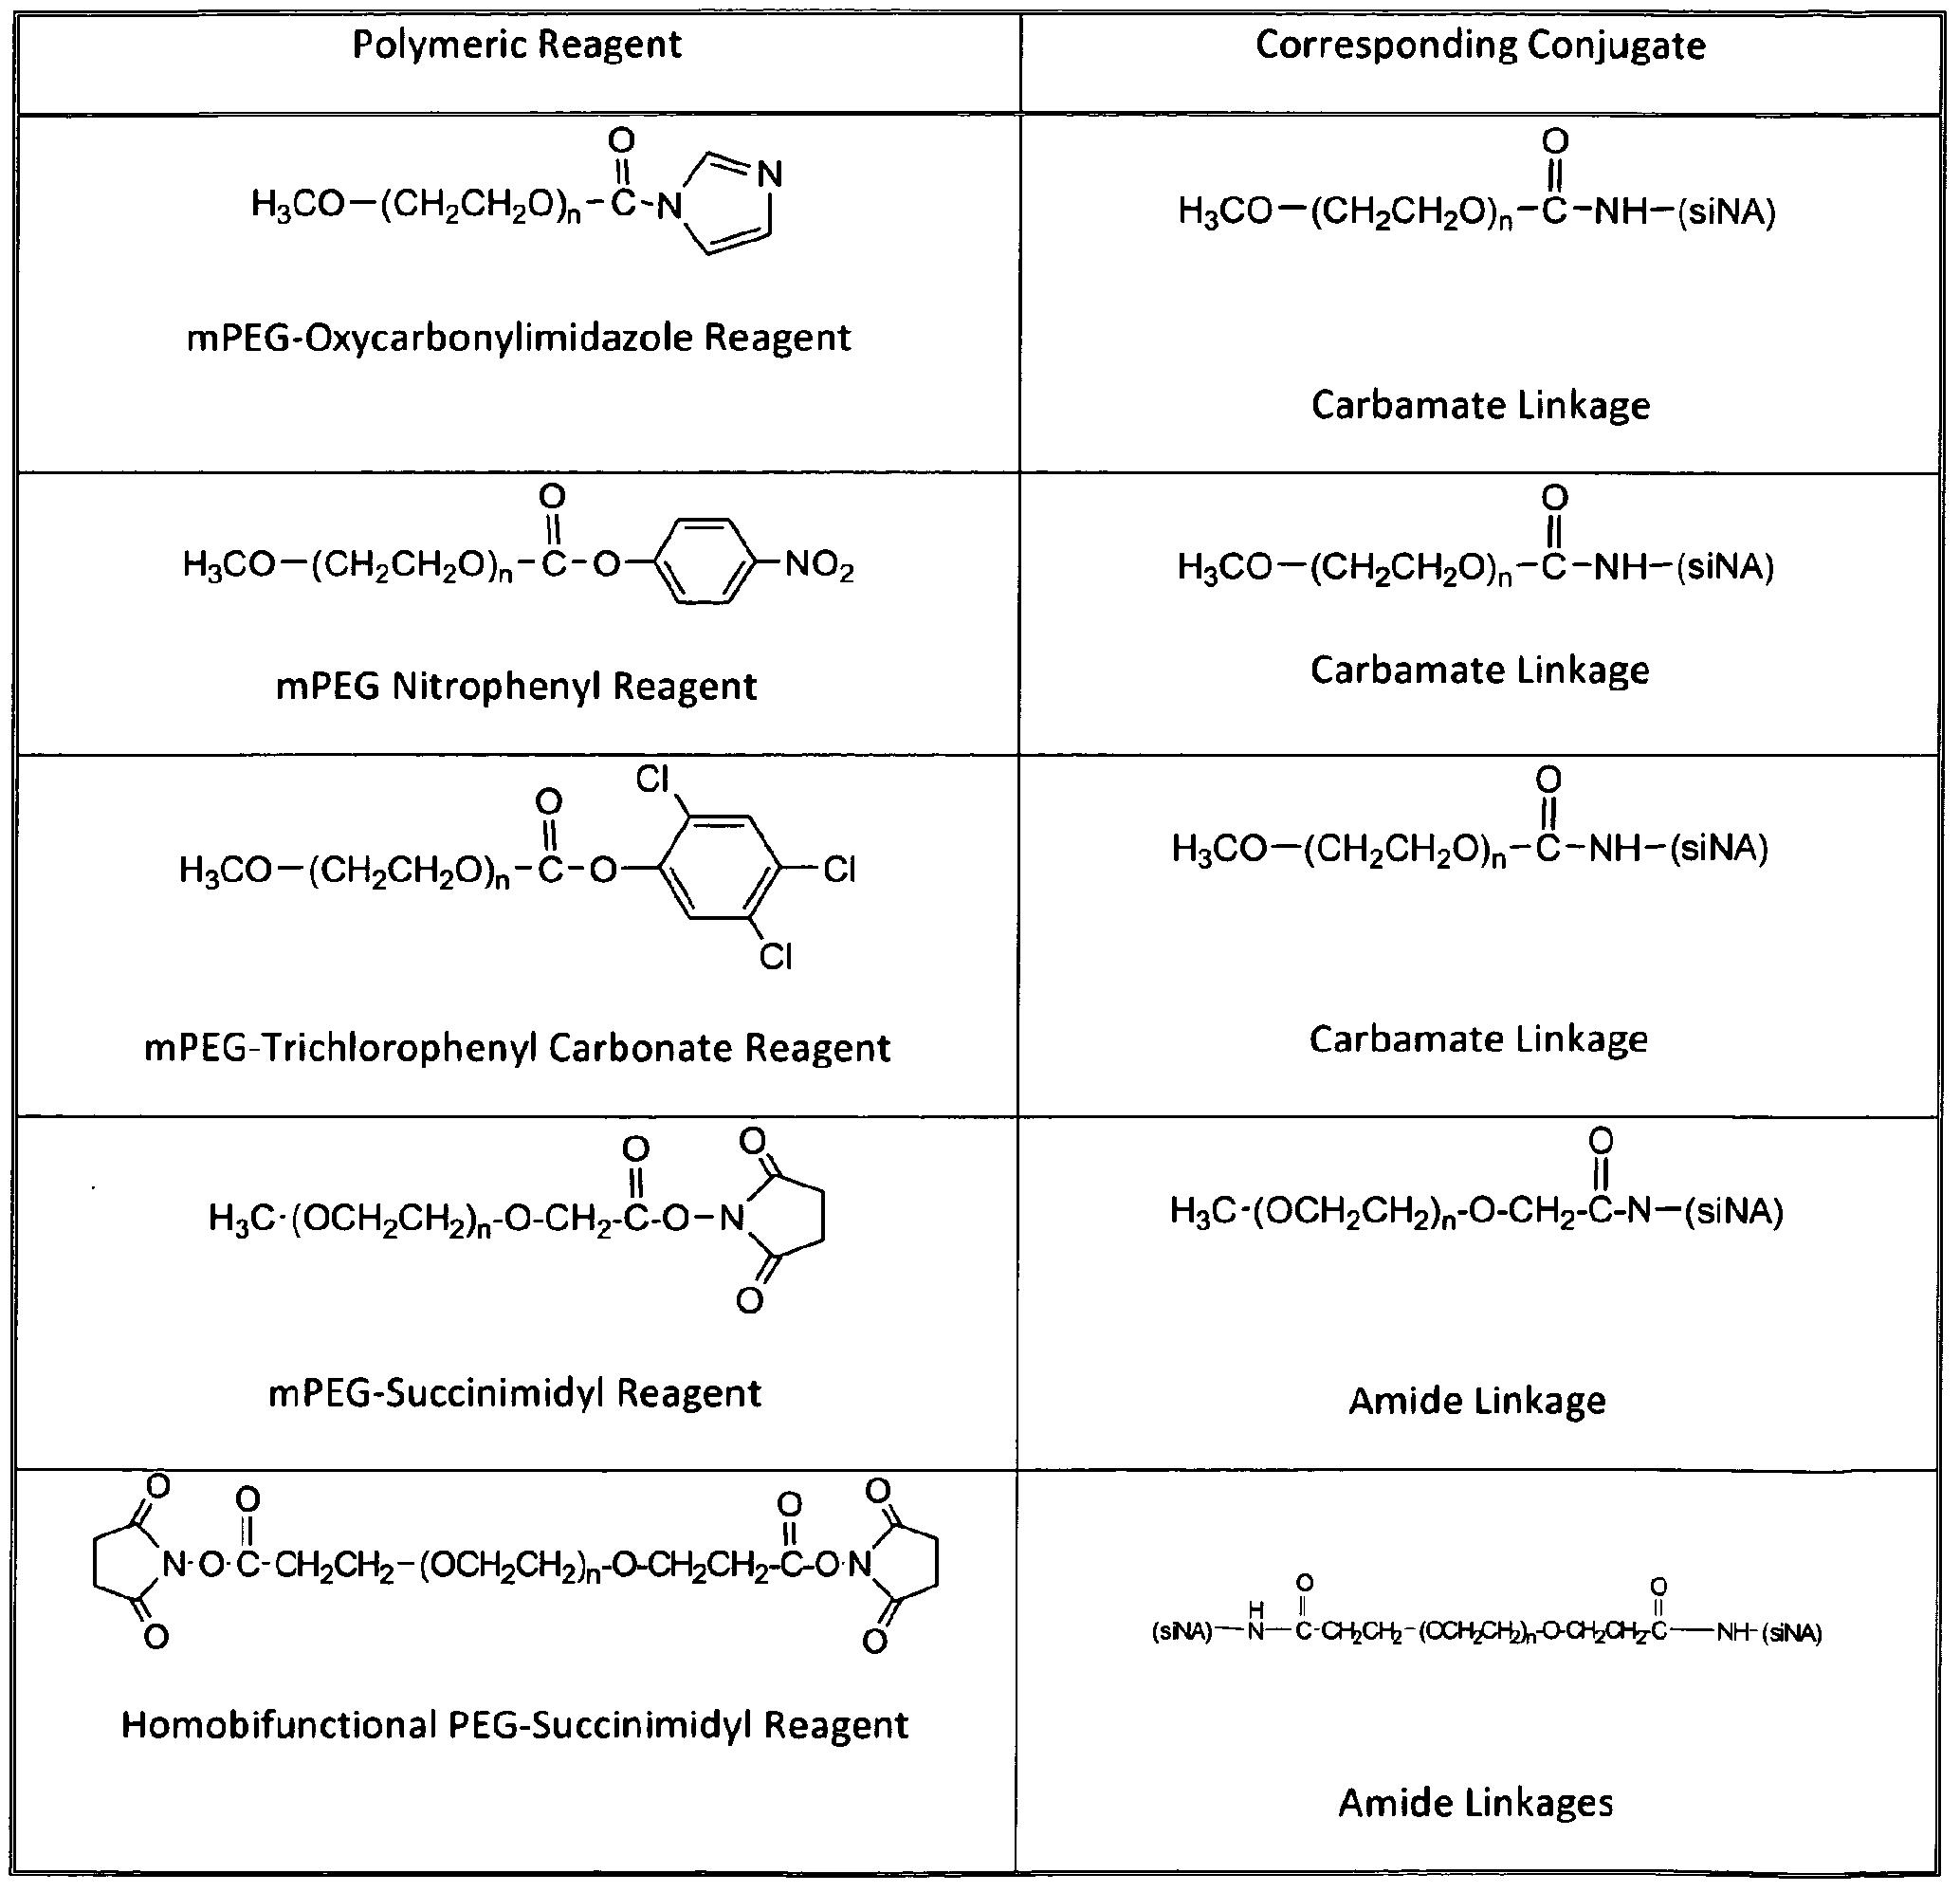 Wo2010021720a1 Conjugates Of Small Interfering Nucleic Acids